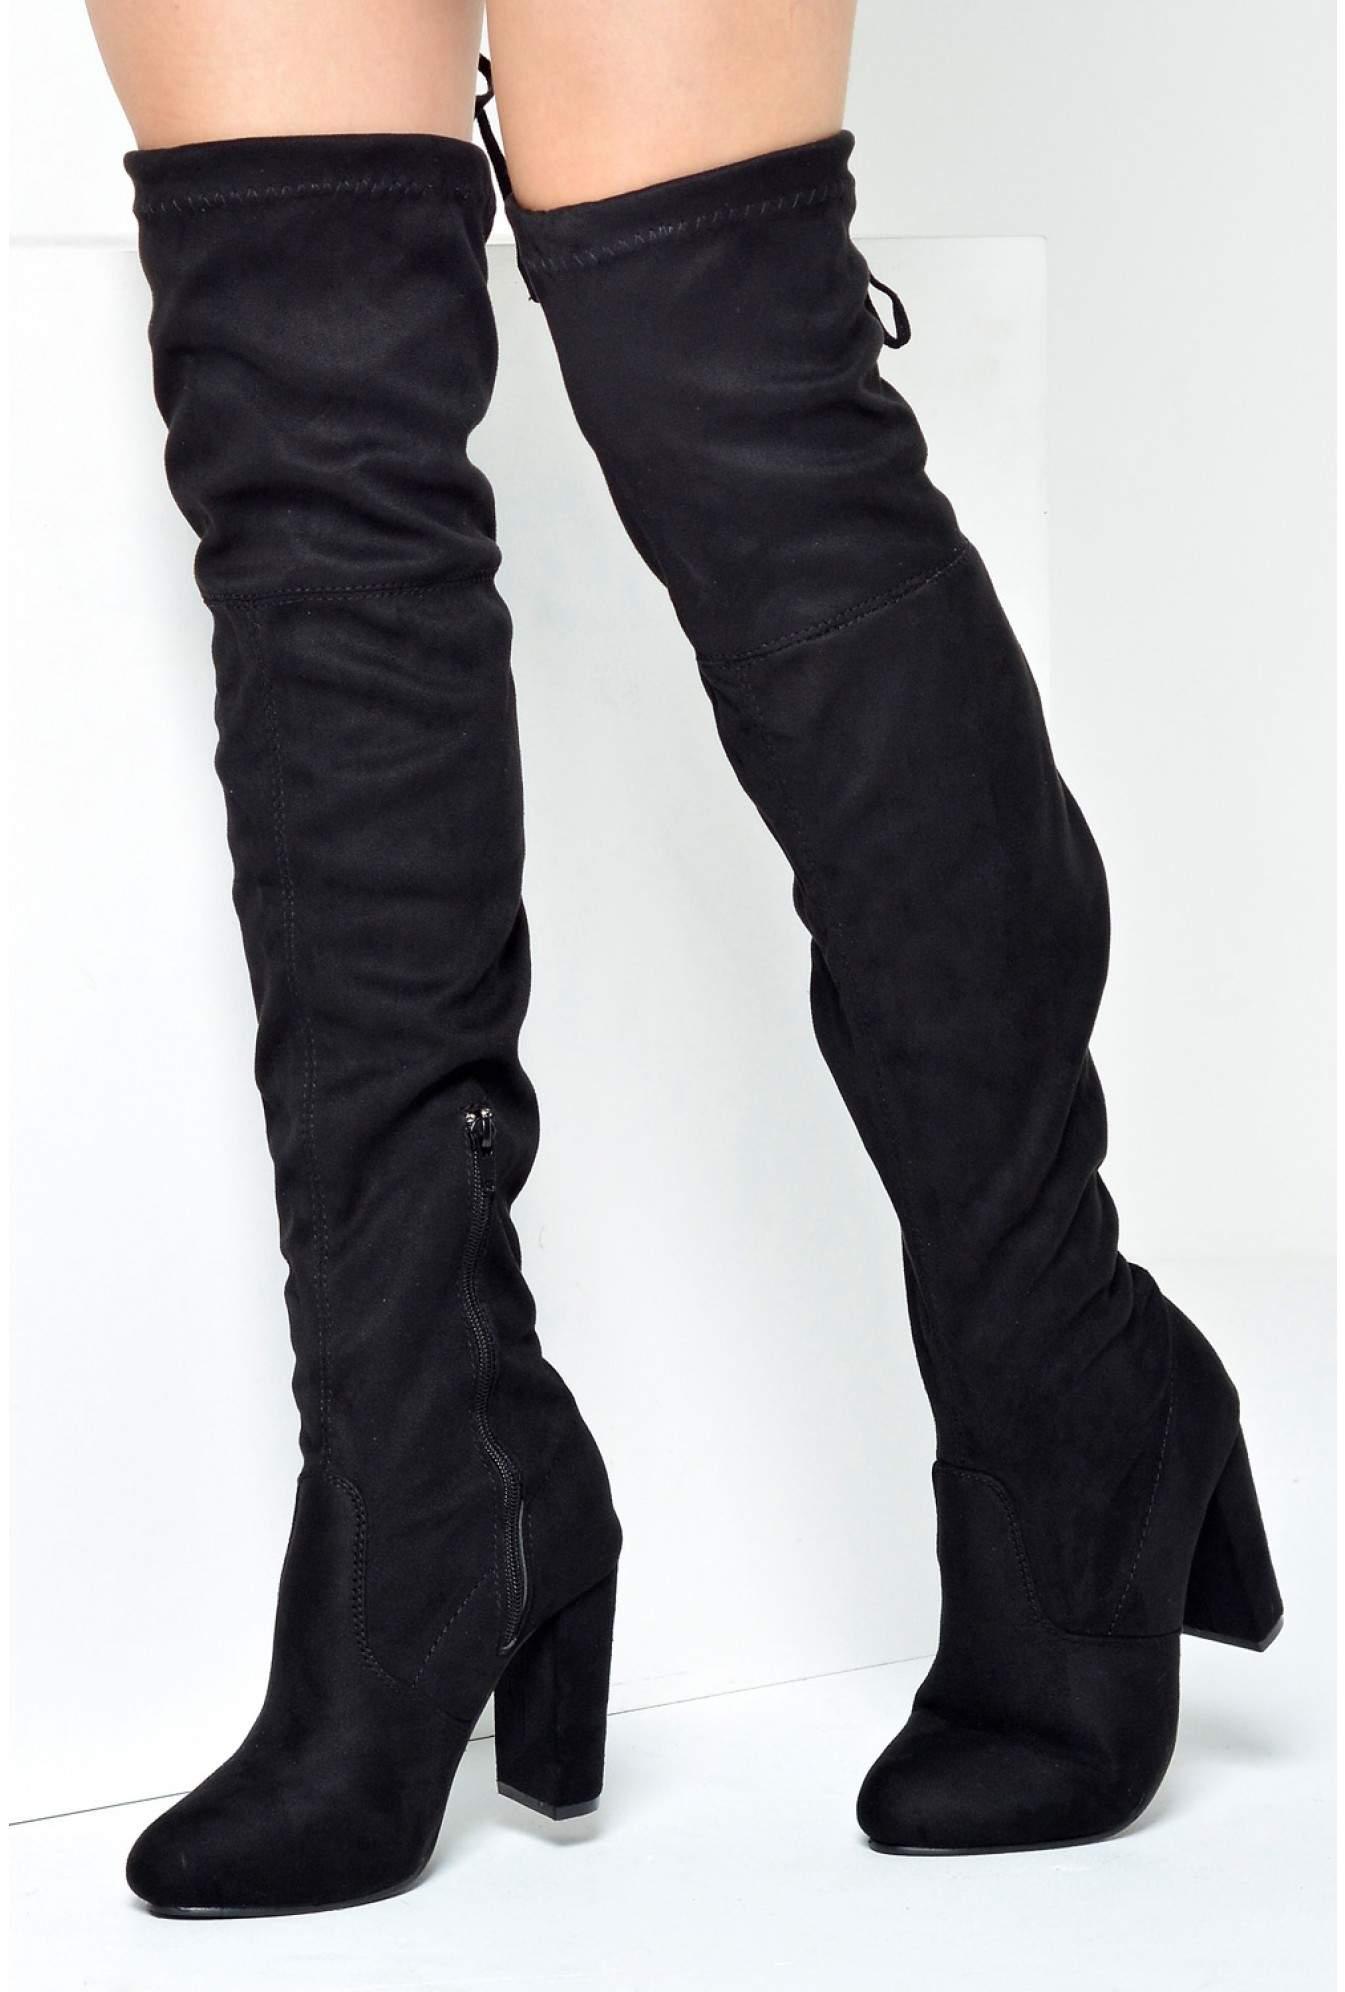 47d5d9ba1d4 More Views. Petal Over the Knee Boots in Black Suede